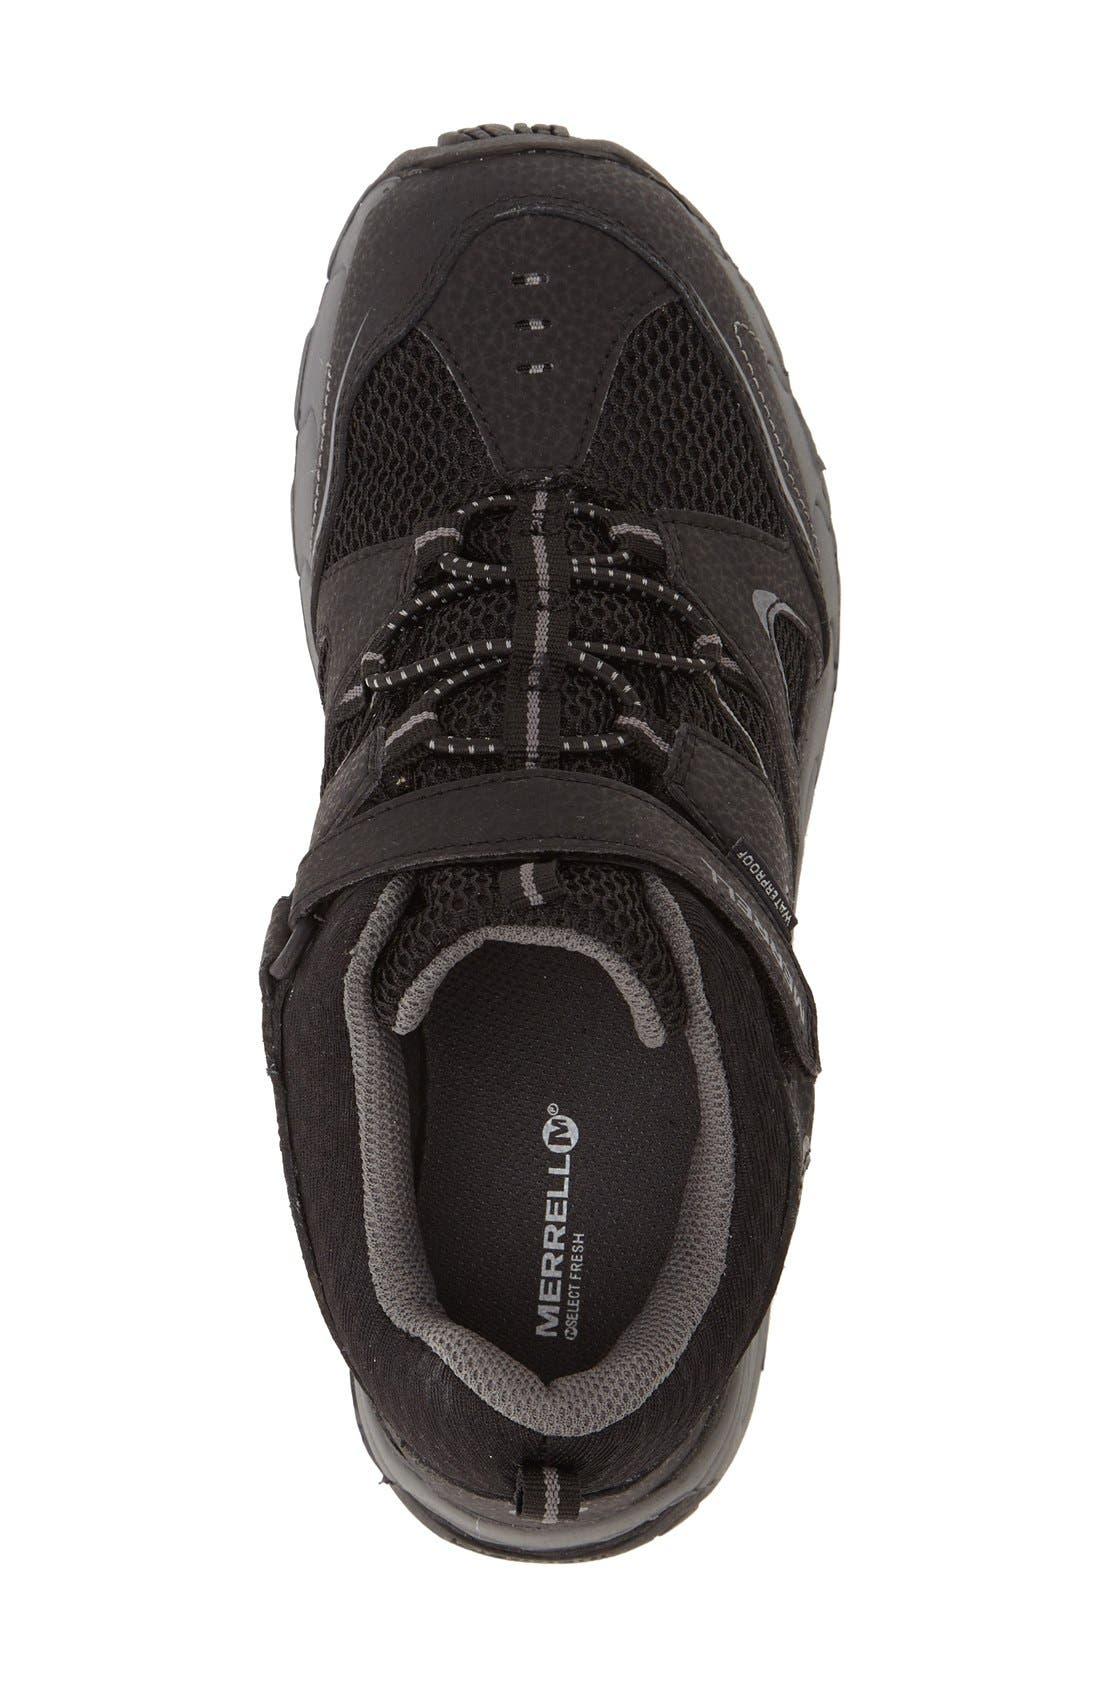 'Hilltop' Waterproof Sneaker,                             Alternate thumbnail 3, color,                             001